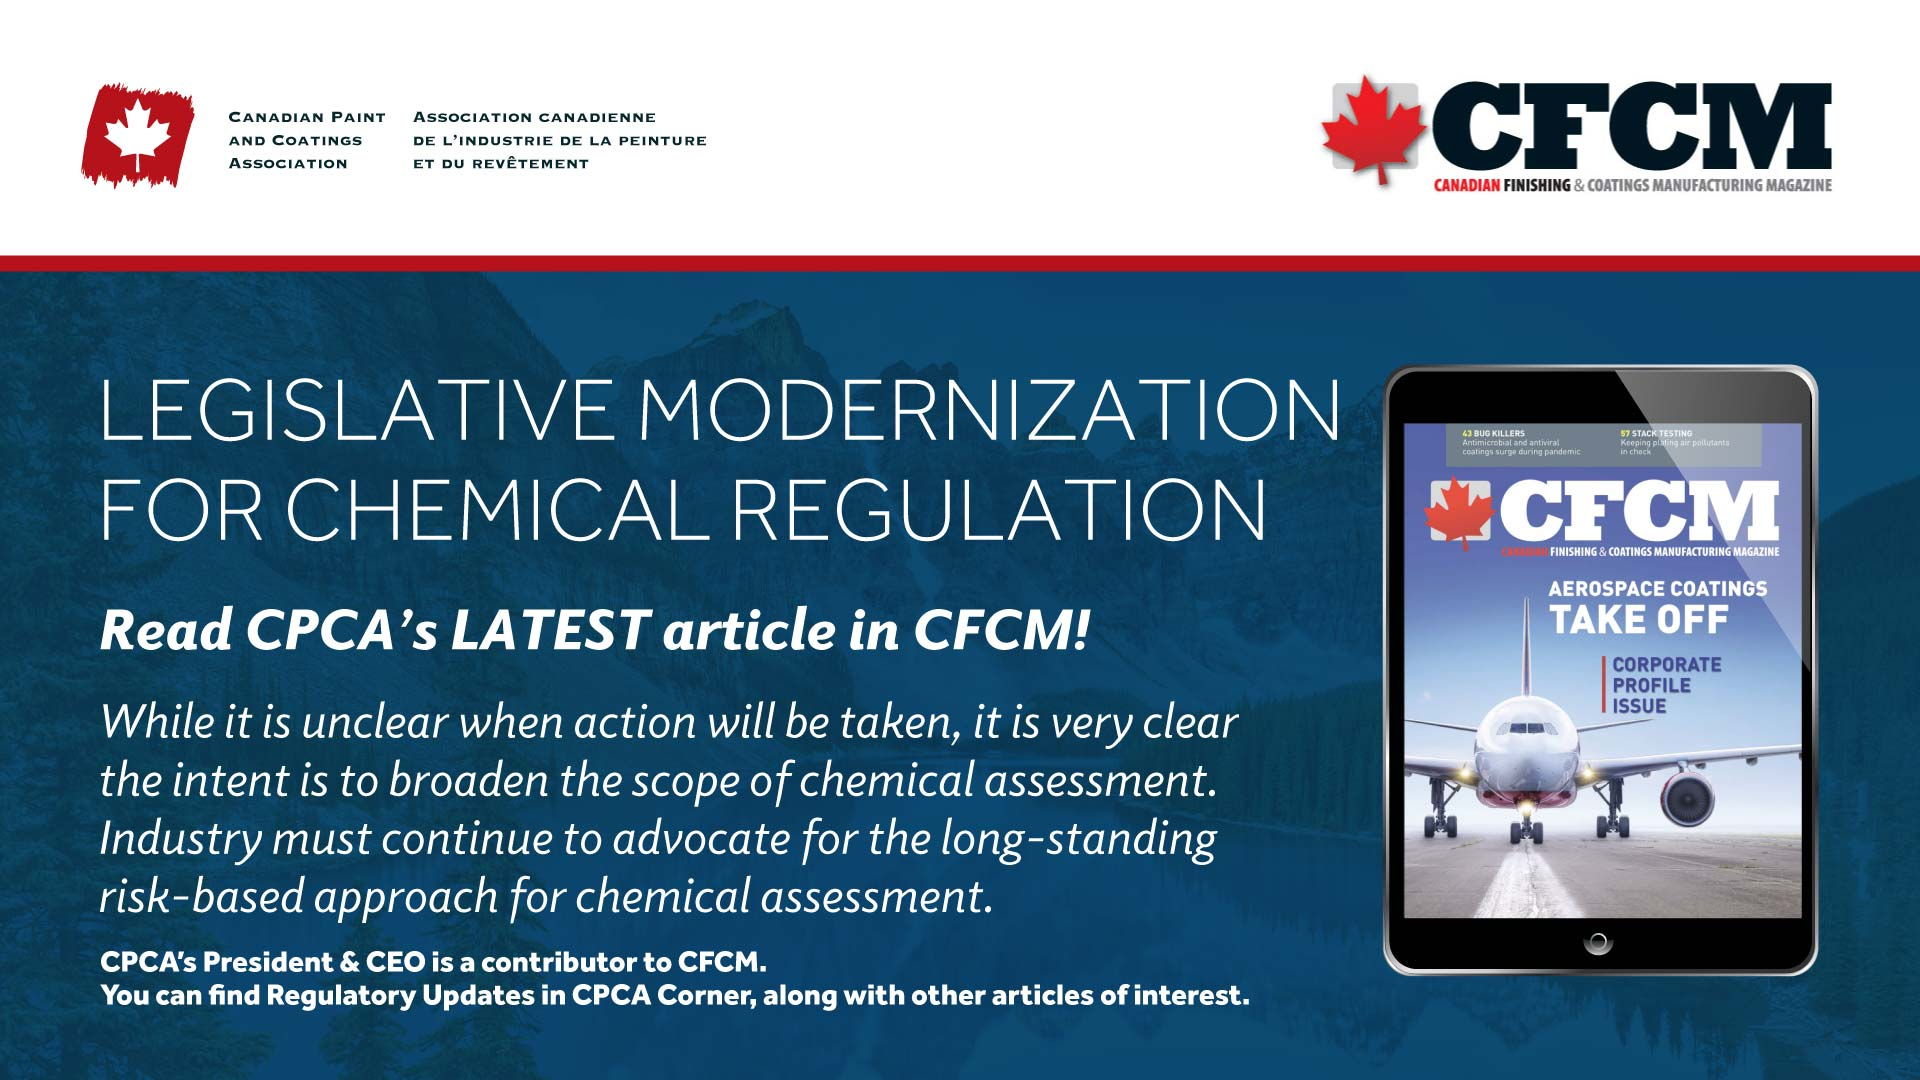 CFCM Article Legislative Modernization for Chemical Regulation